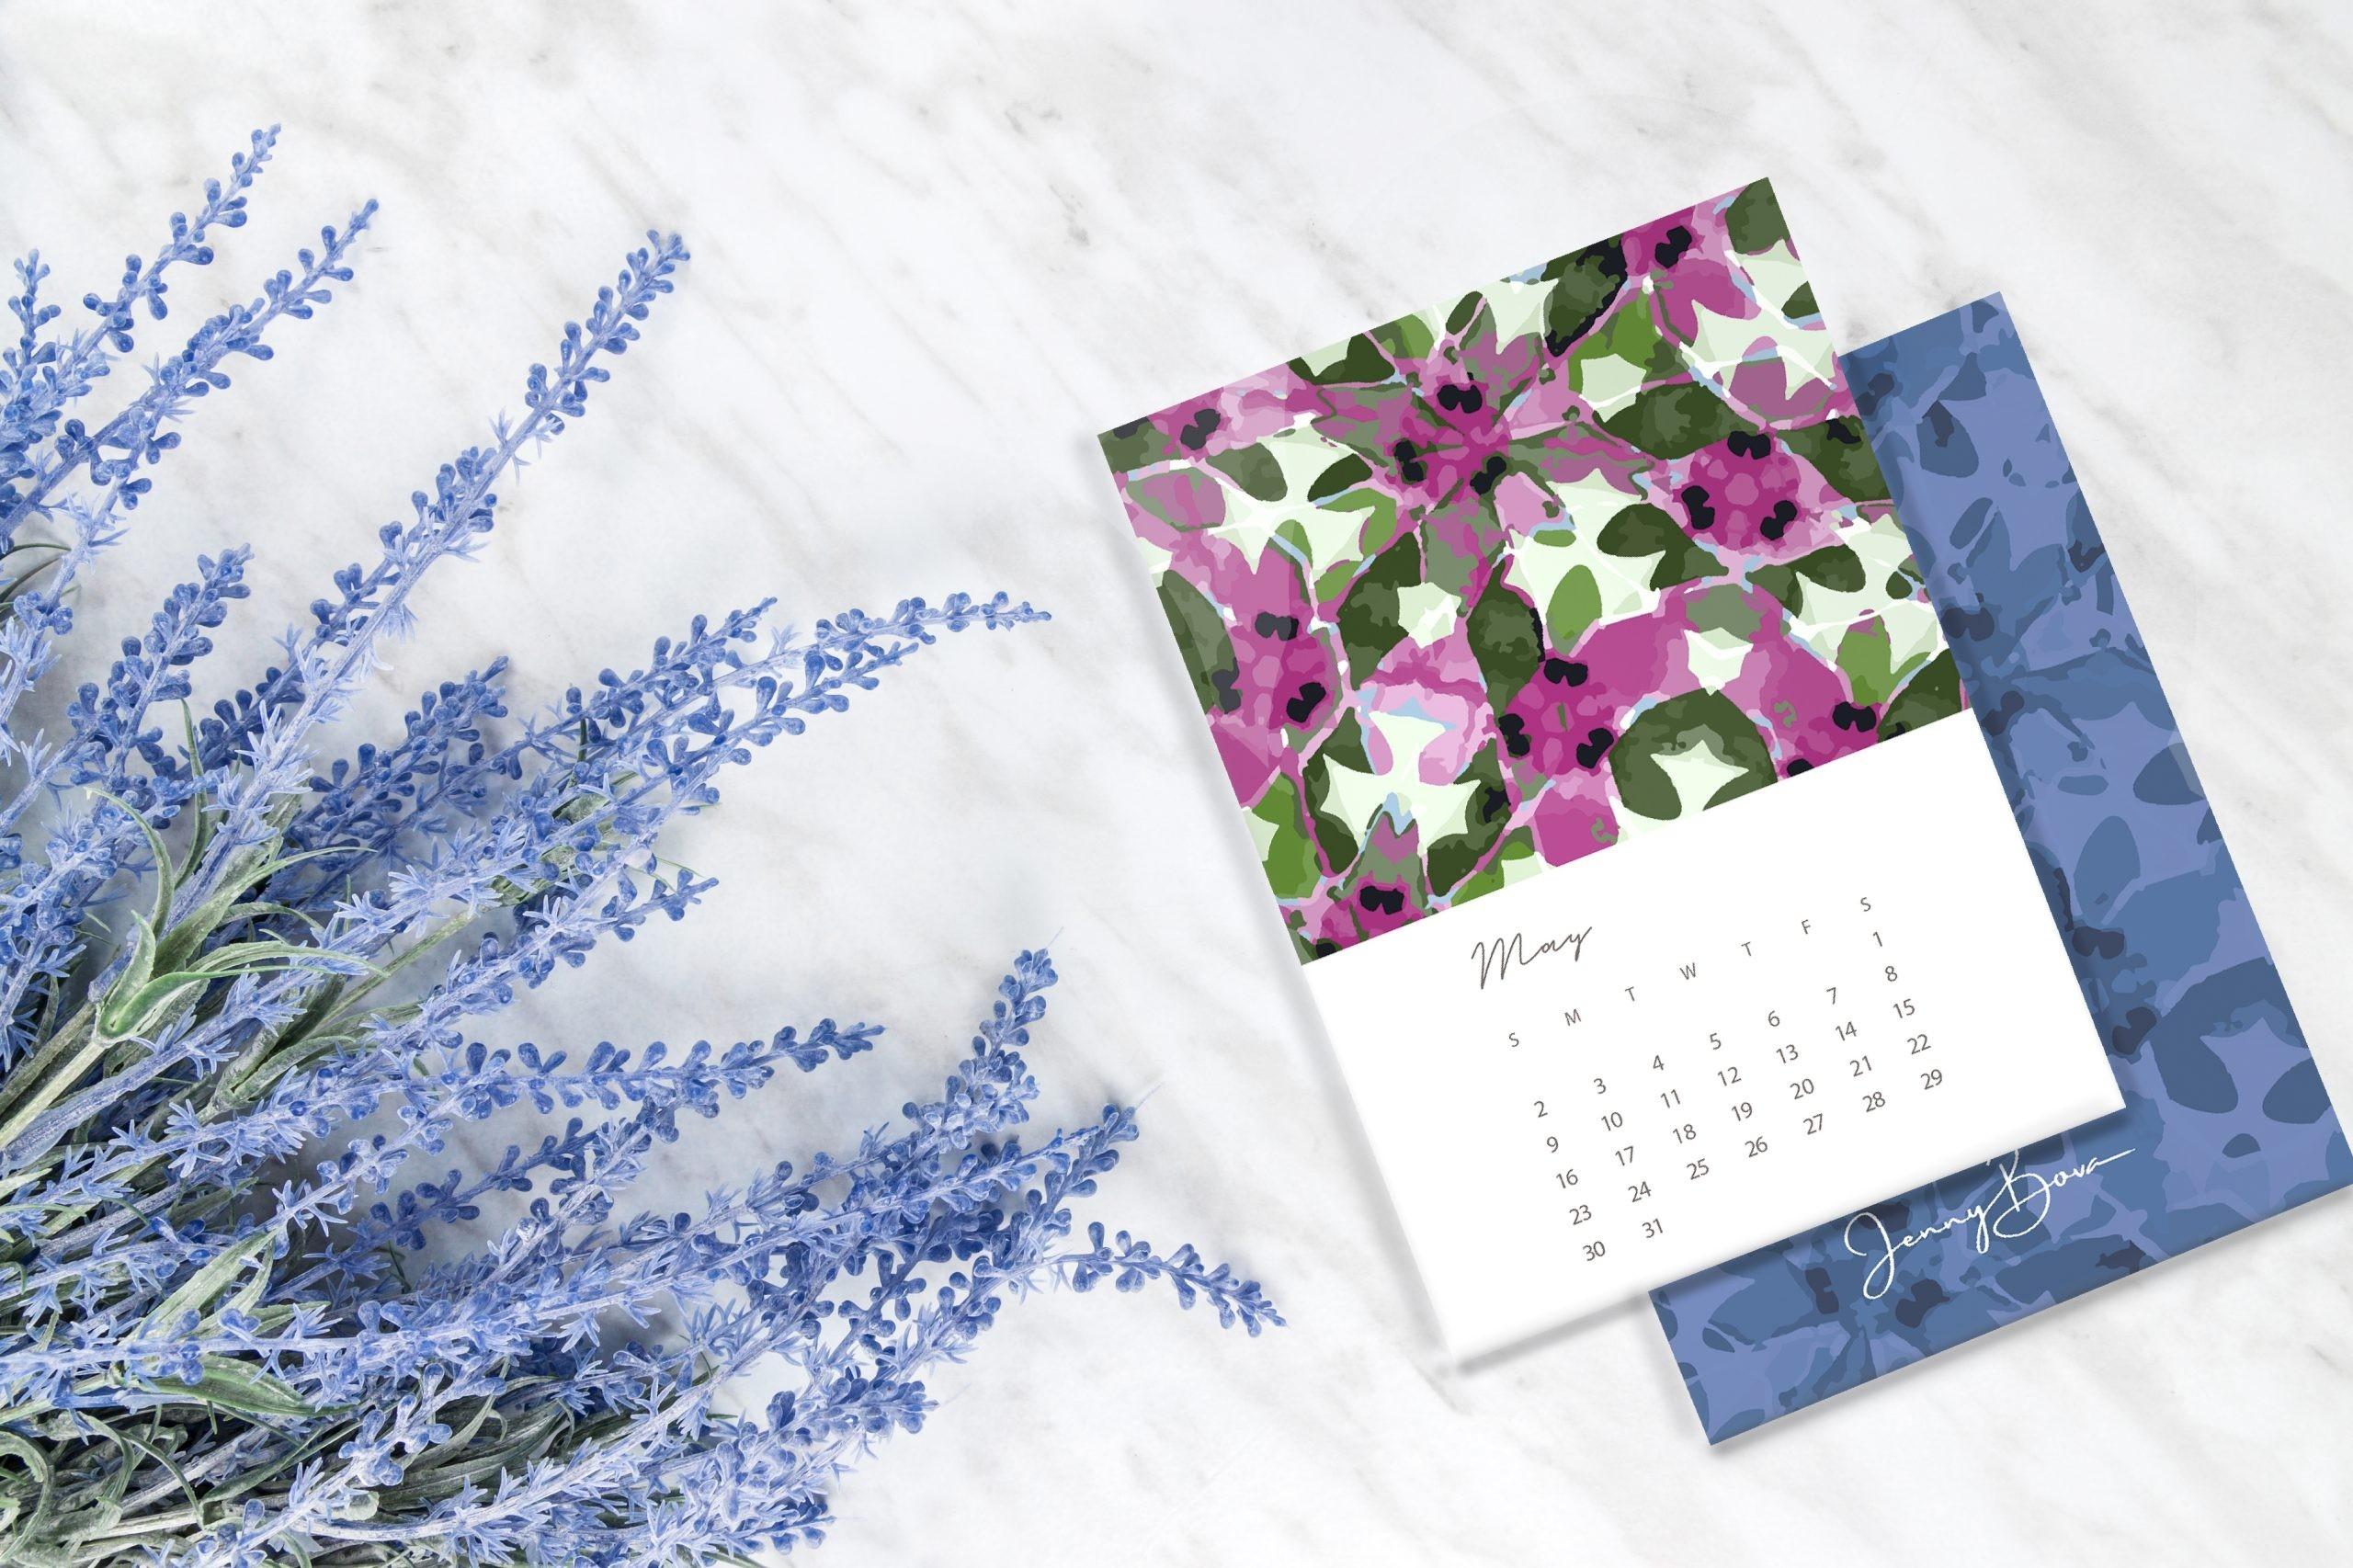 Top 5 Desk Calendars For 2021 - Pattern Observer  Depo Calendar 2021 Double Sidede